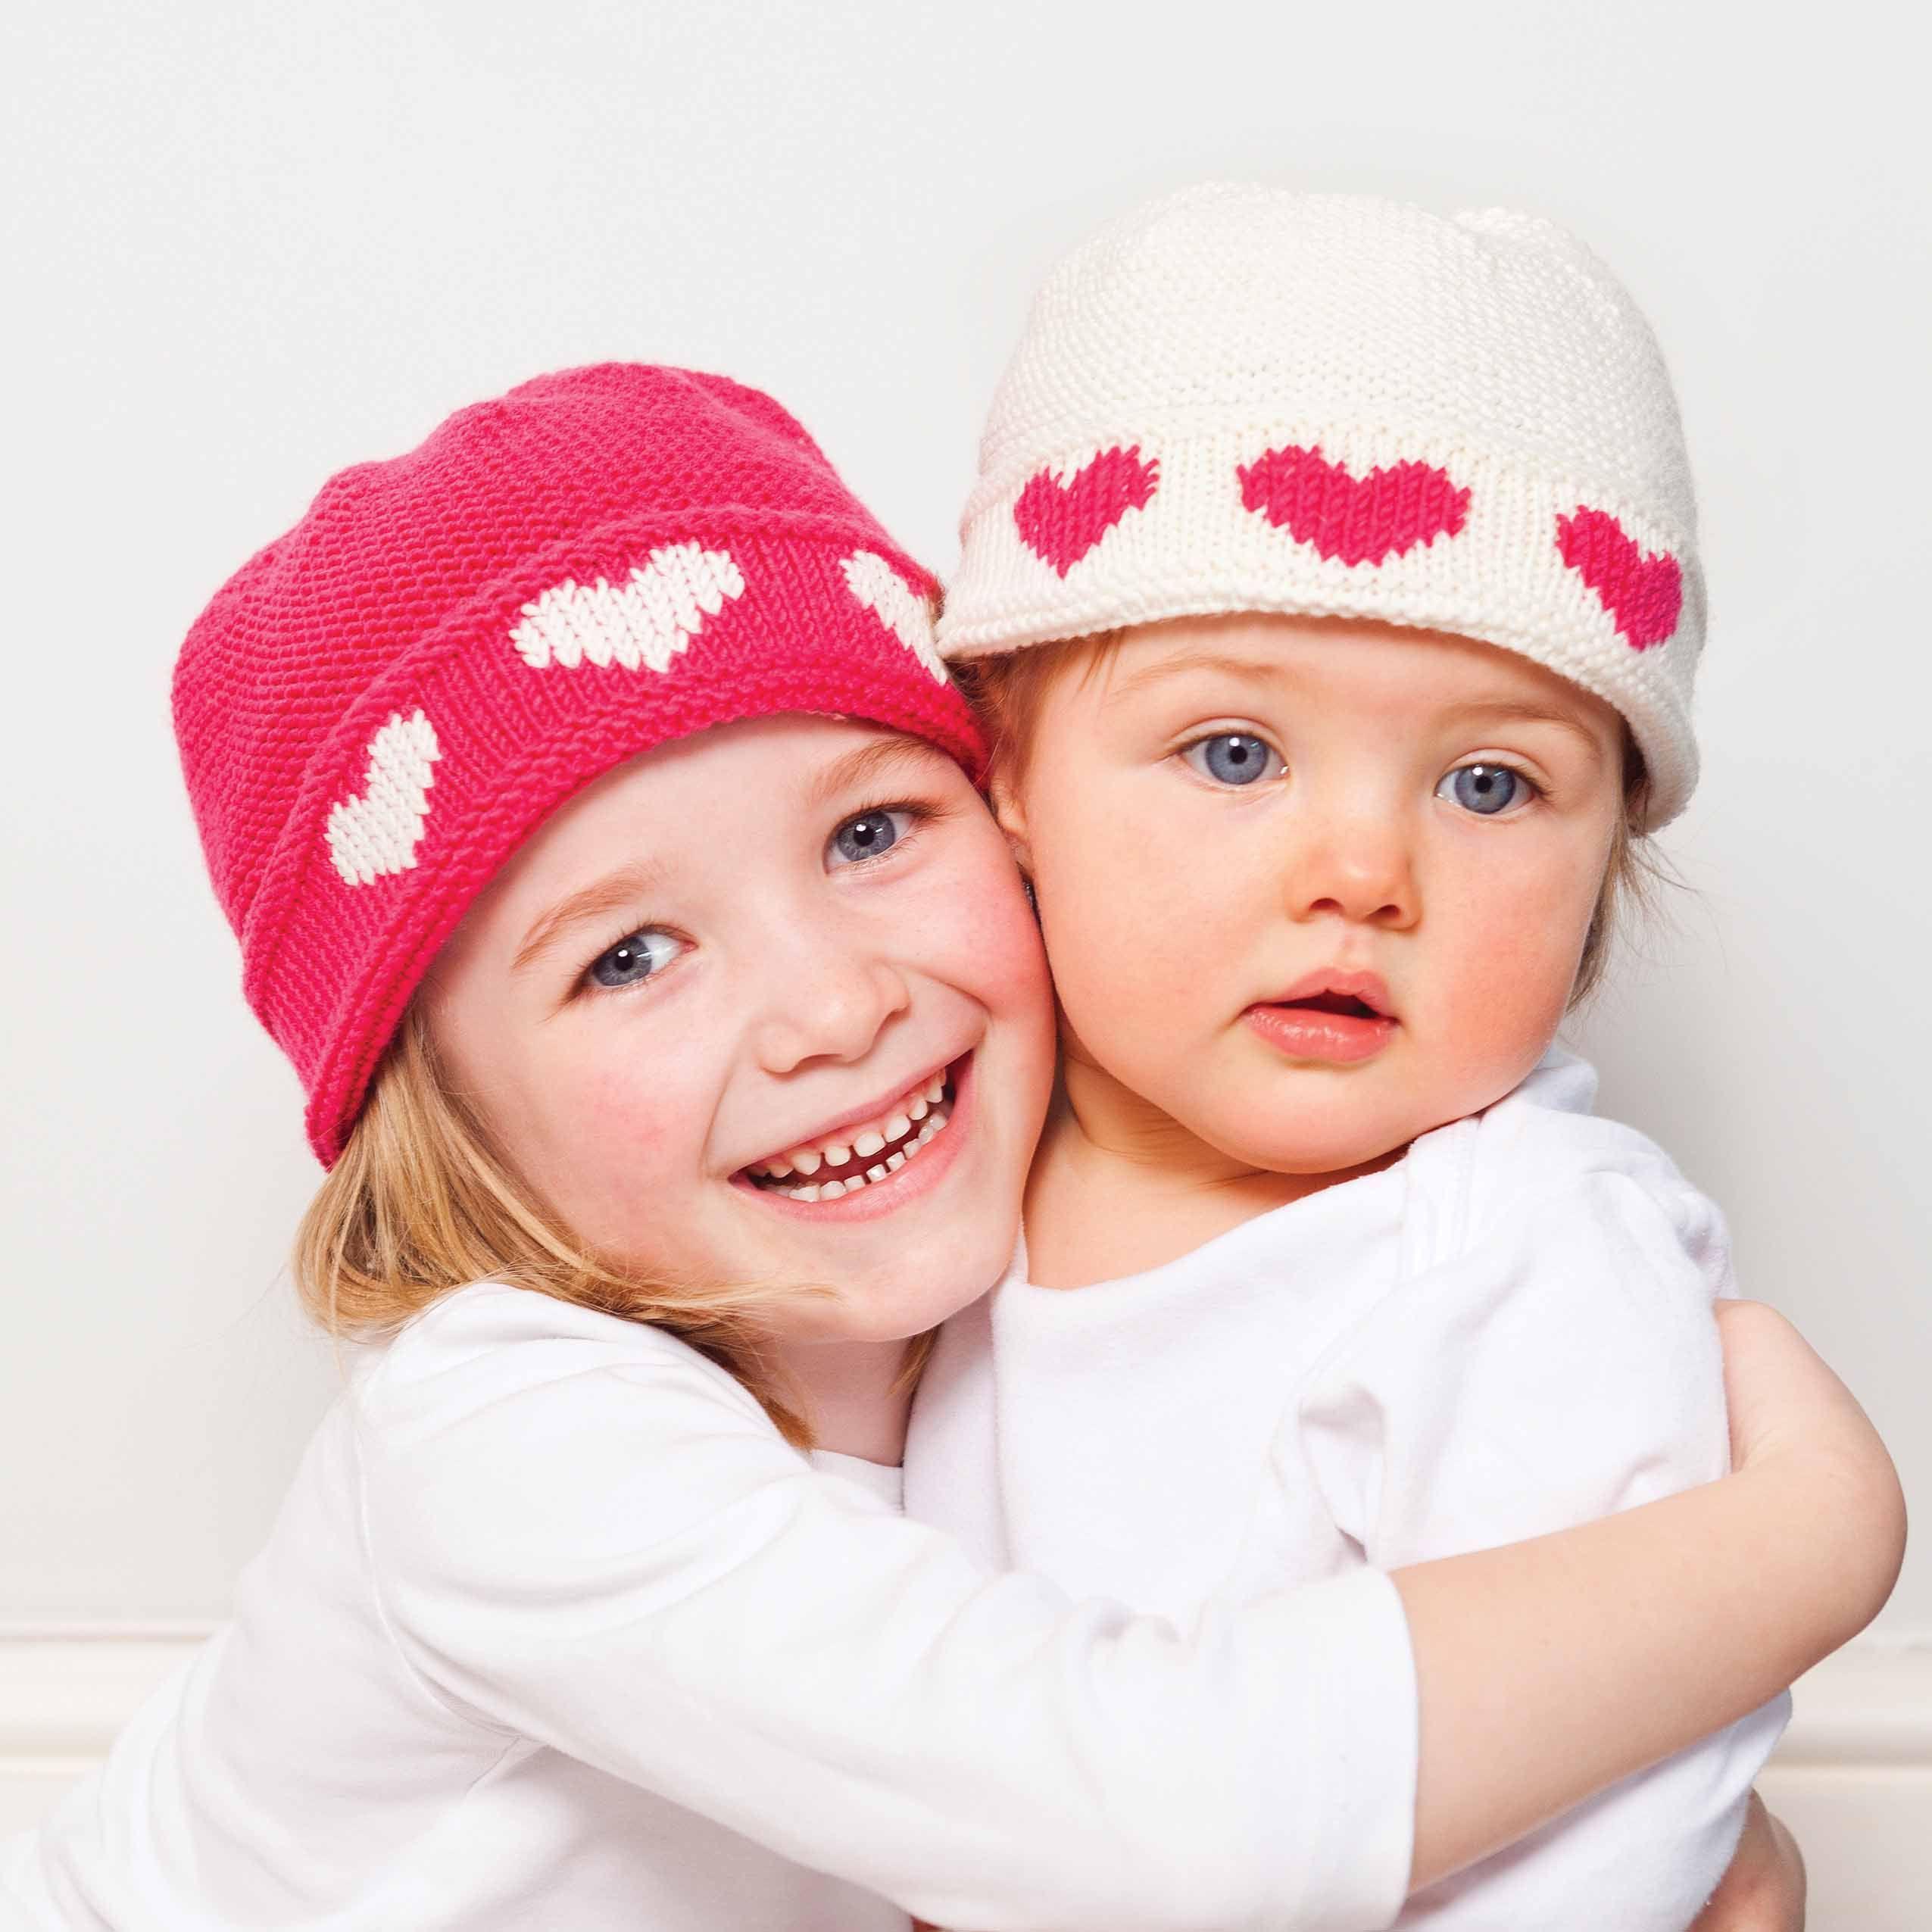 19f89da80 FREE BABY HAT PATTERN FOR VALENTINE S DAY